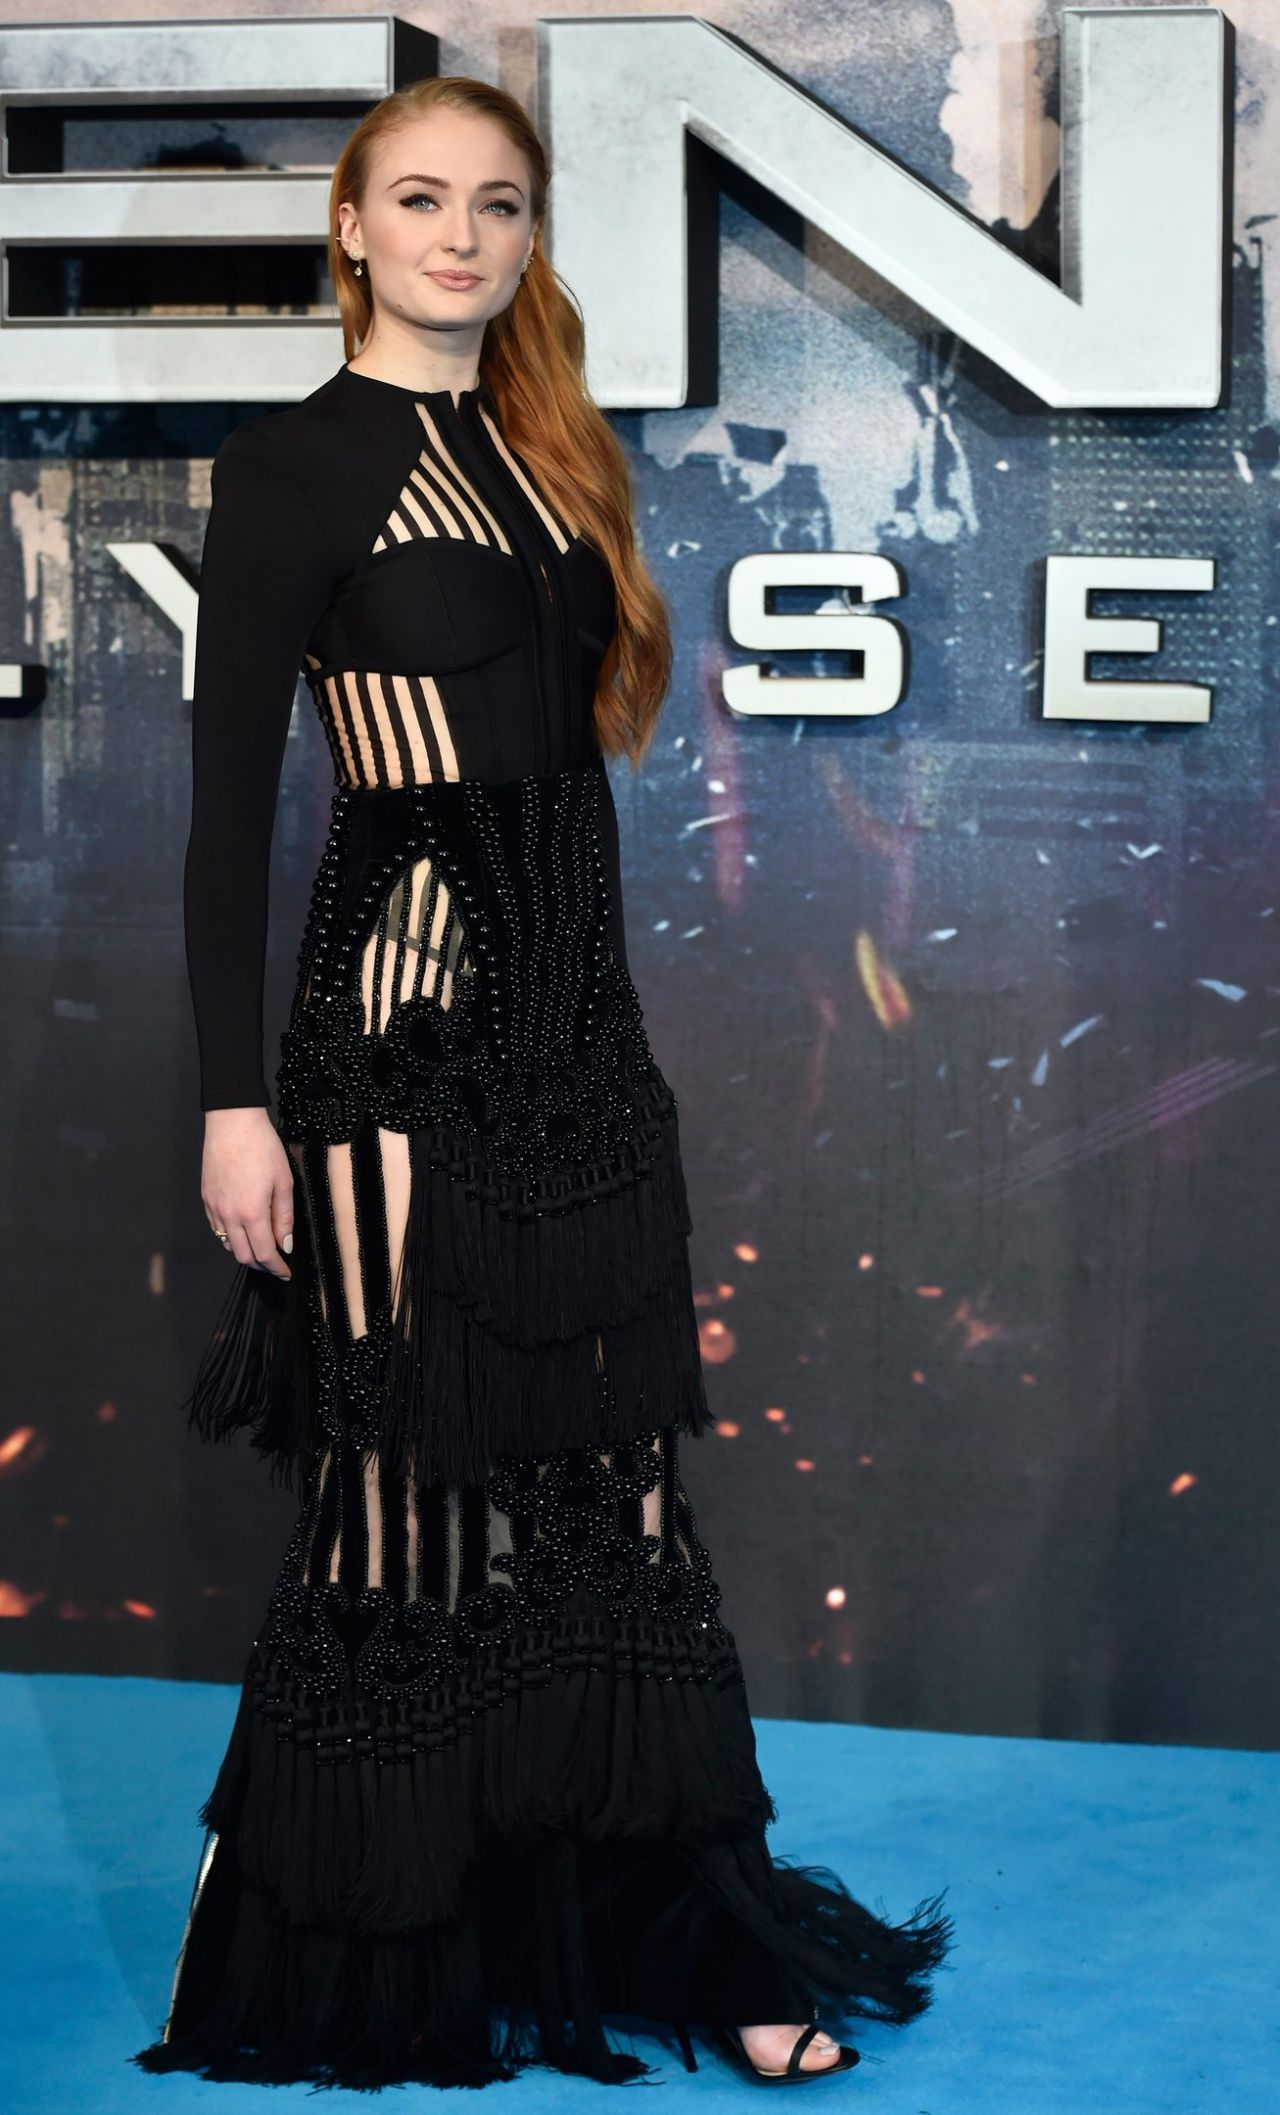 Sophie Turner X Men Apocalypse Premiere In London Uk 5